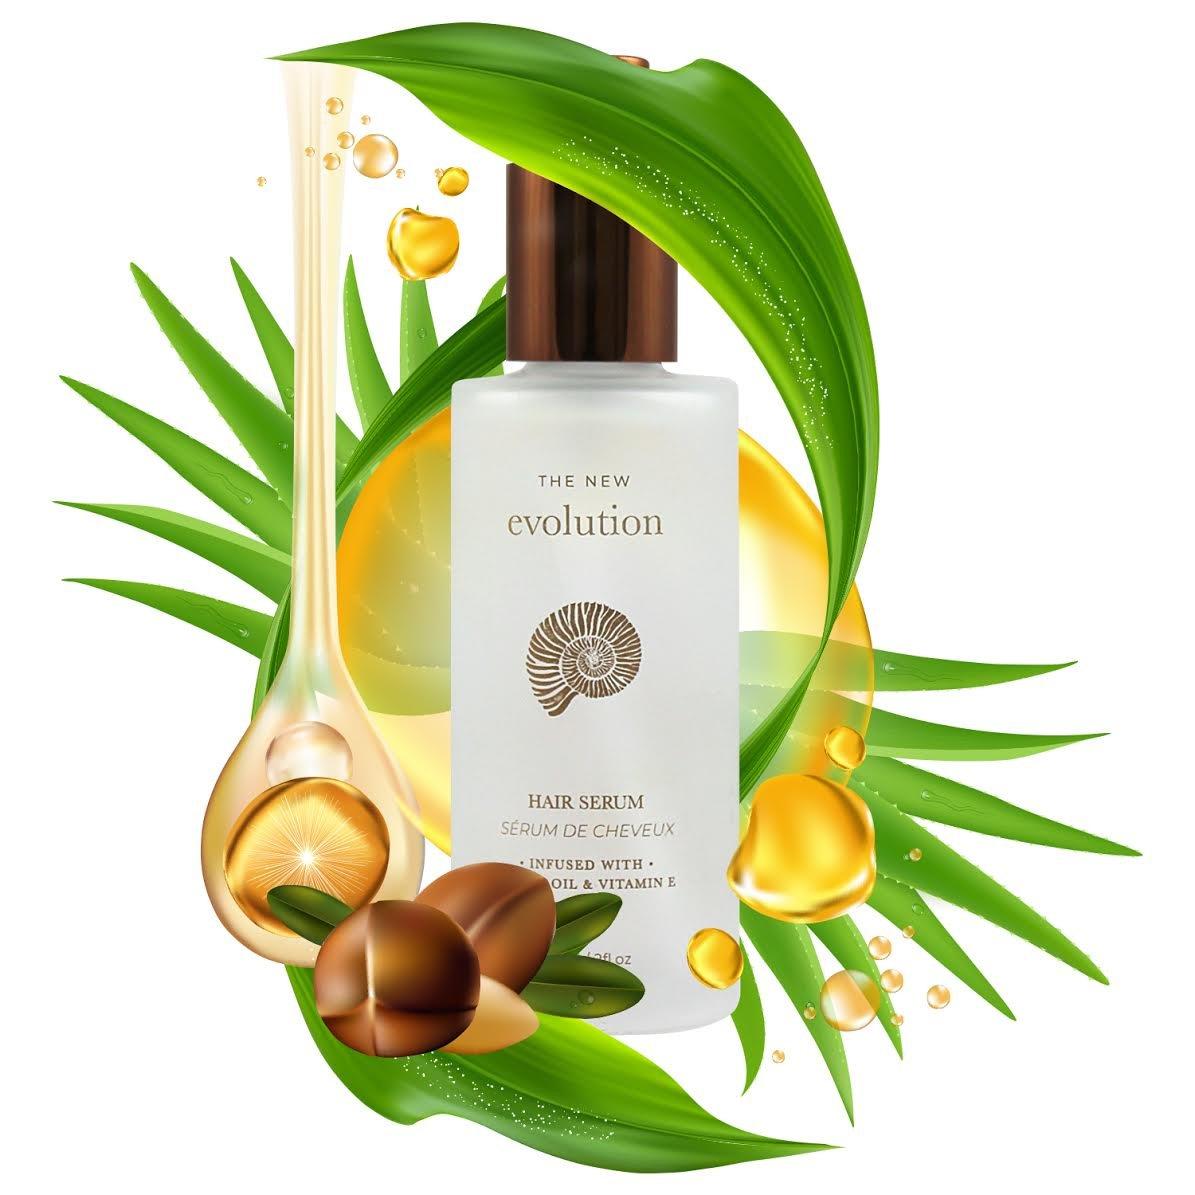 Evolution Argan Oil Hair Serum with Vitamin E and Aloe Vera, 2 Fl. Oz./60 Ml